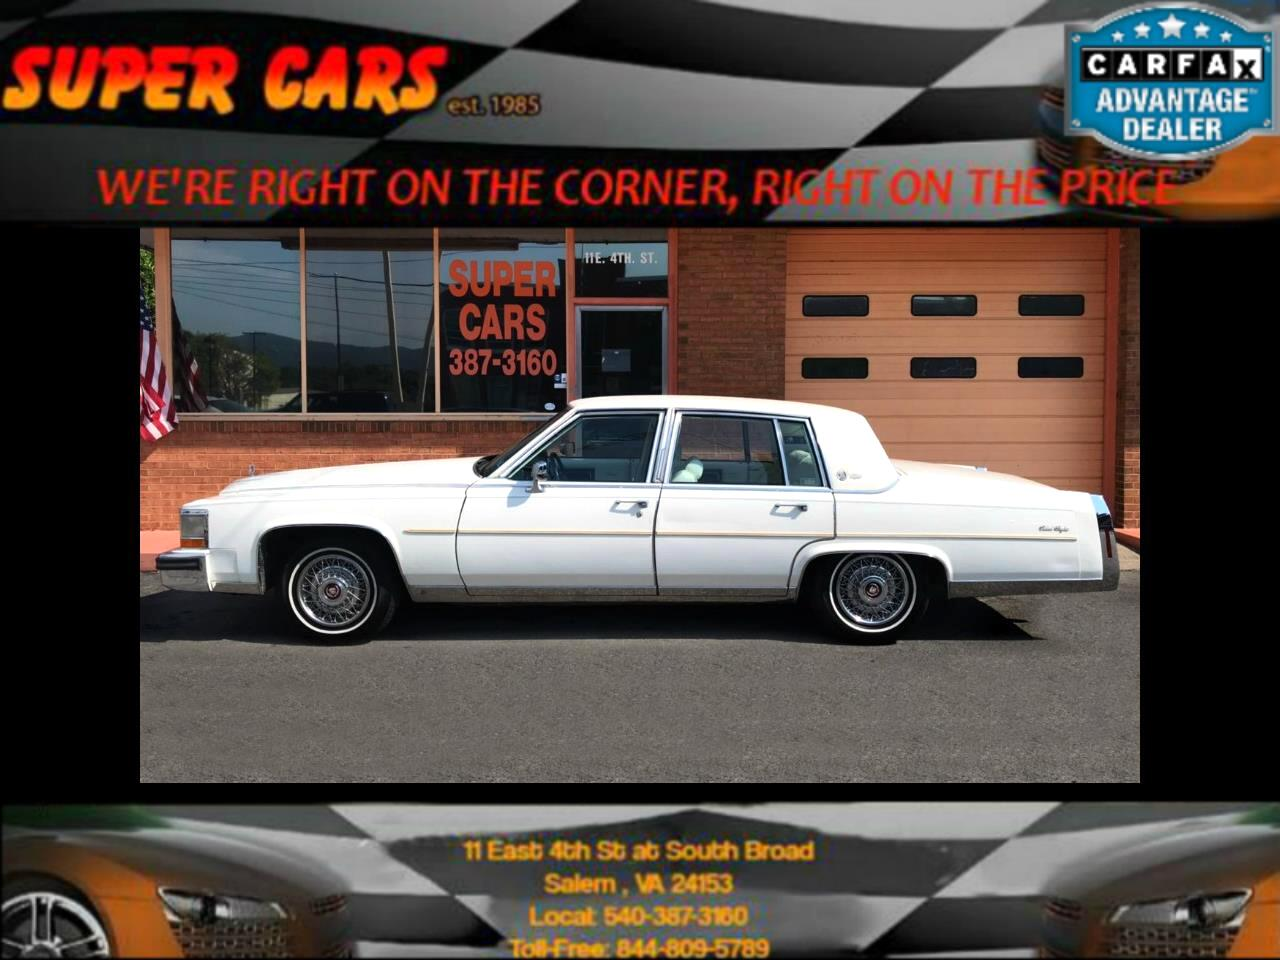 1986 Cadillac Fleetwood Brougham Sedan